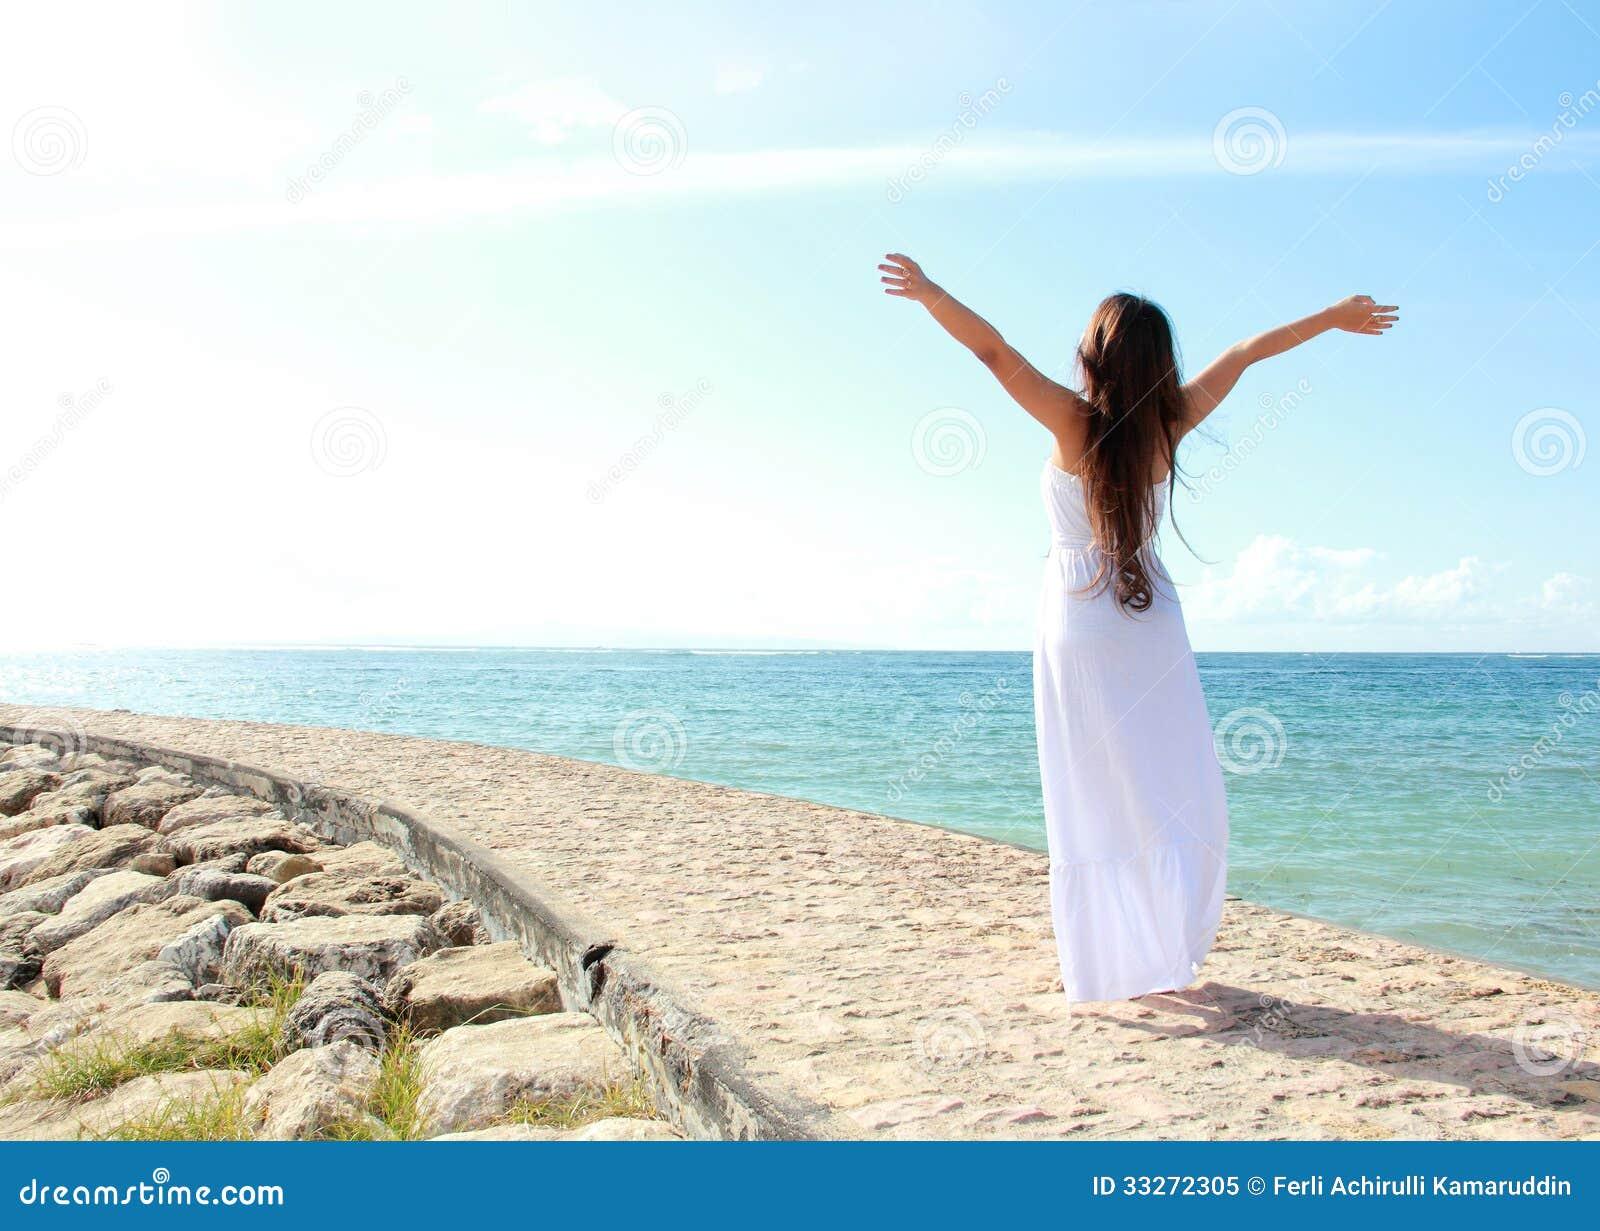 Free beach freedom beach nudism naturalist video 4